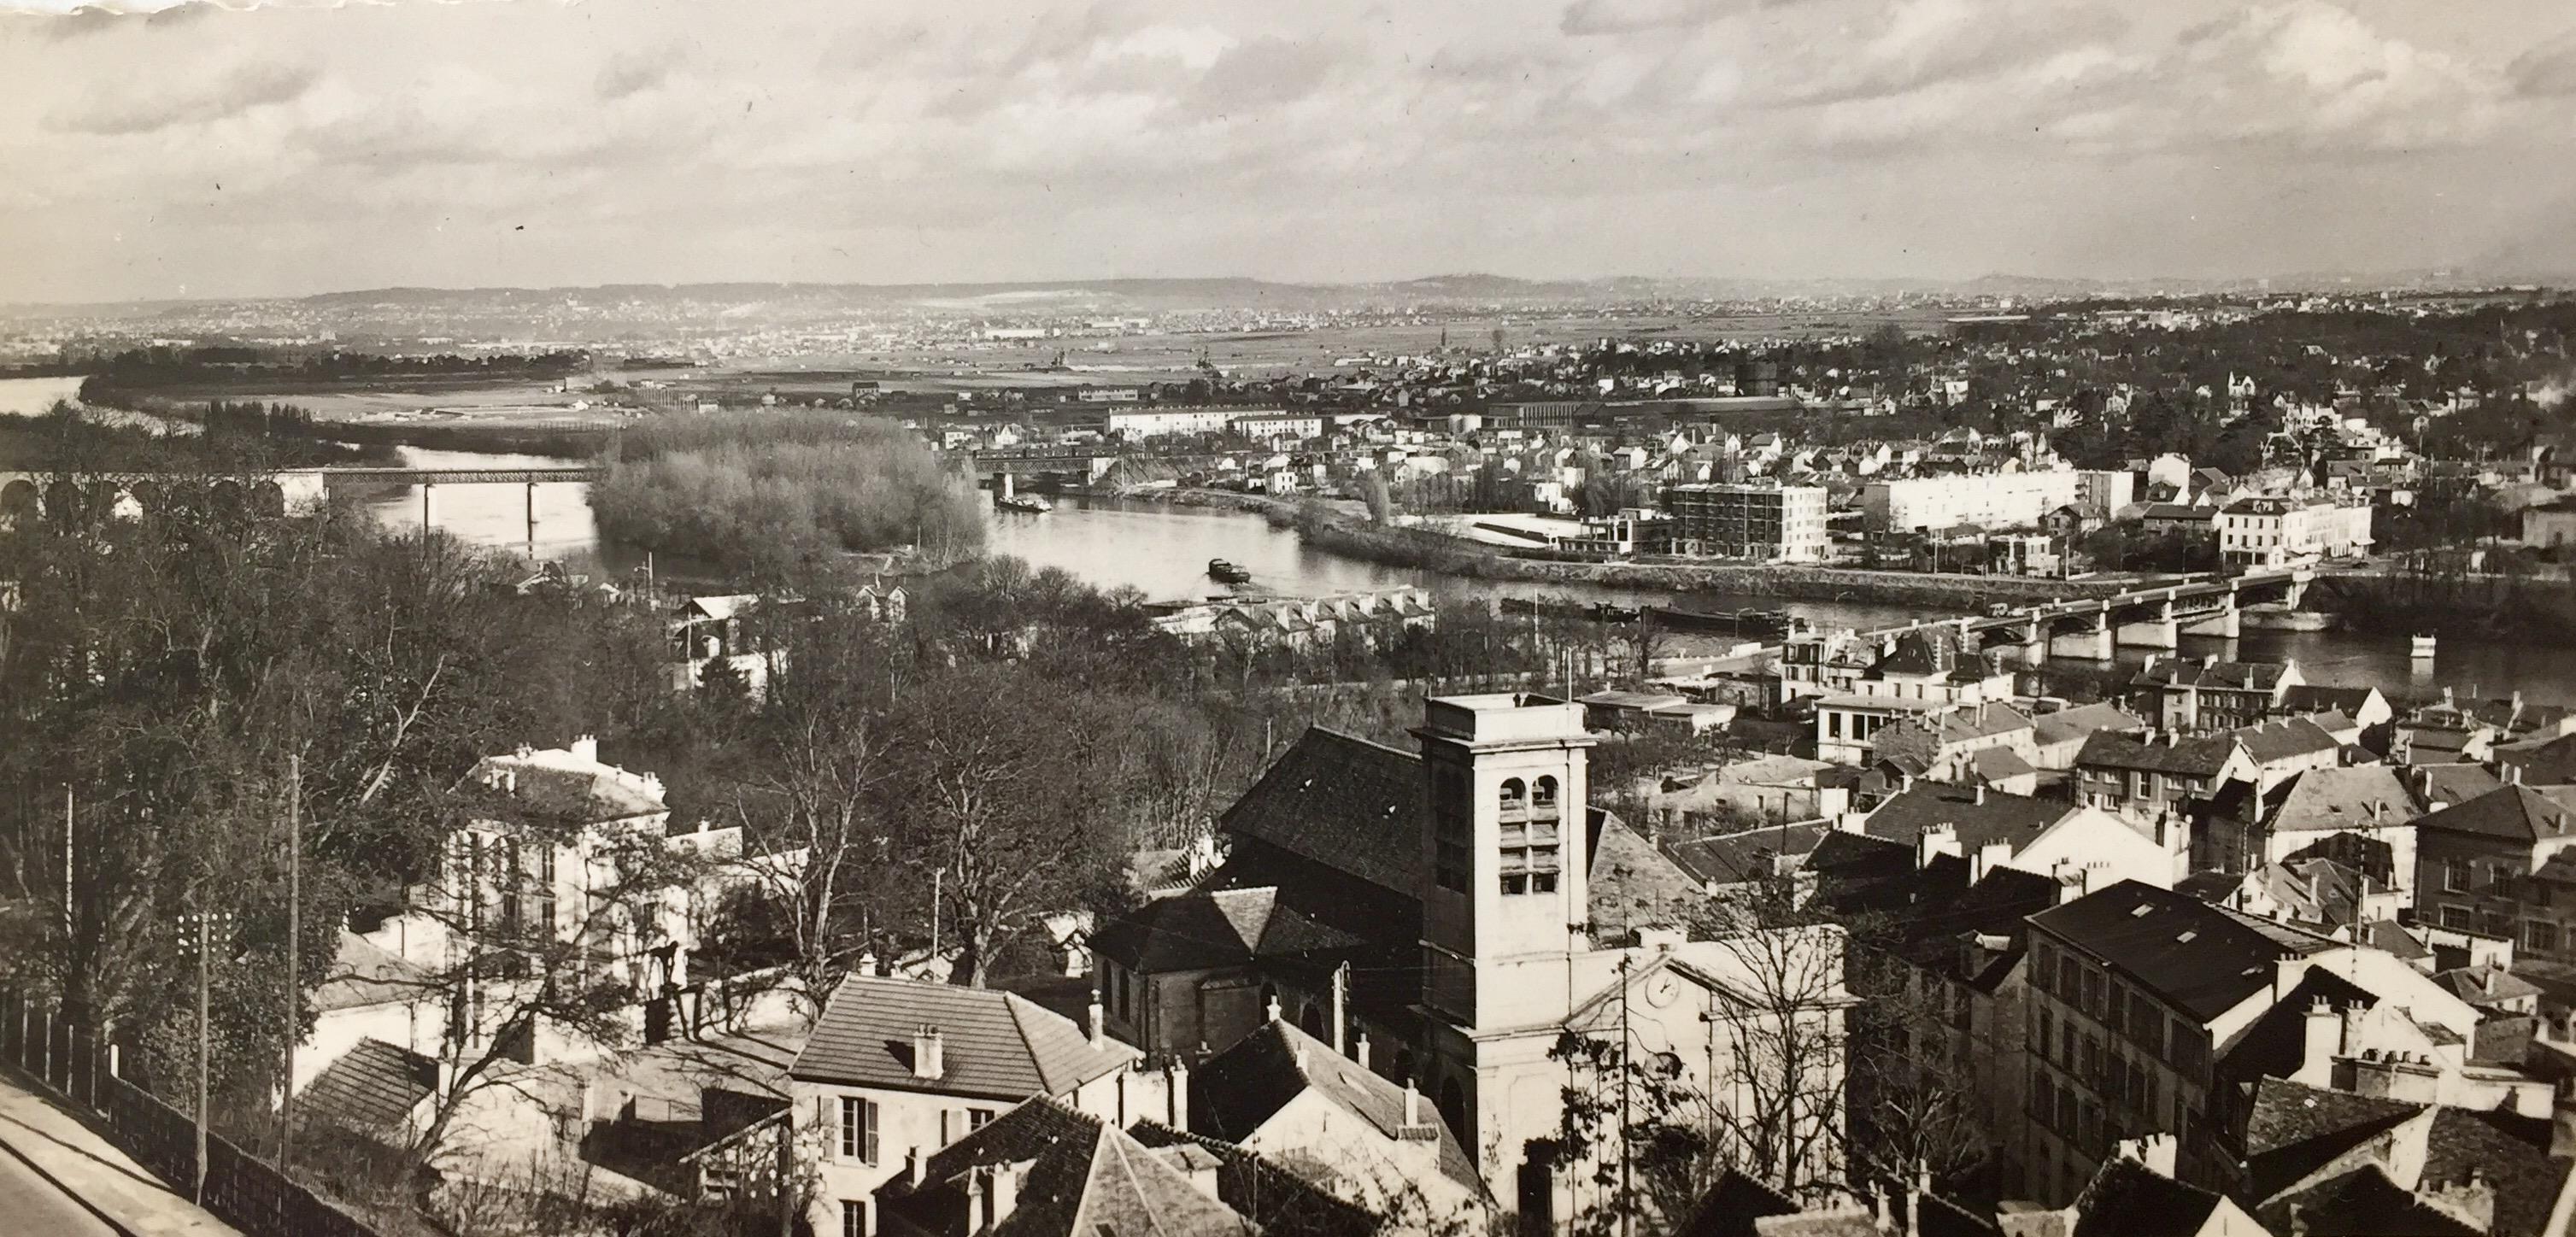 Le Pecq, vallée de la Seine, jadis